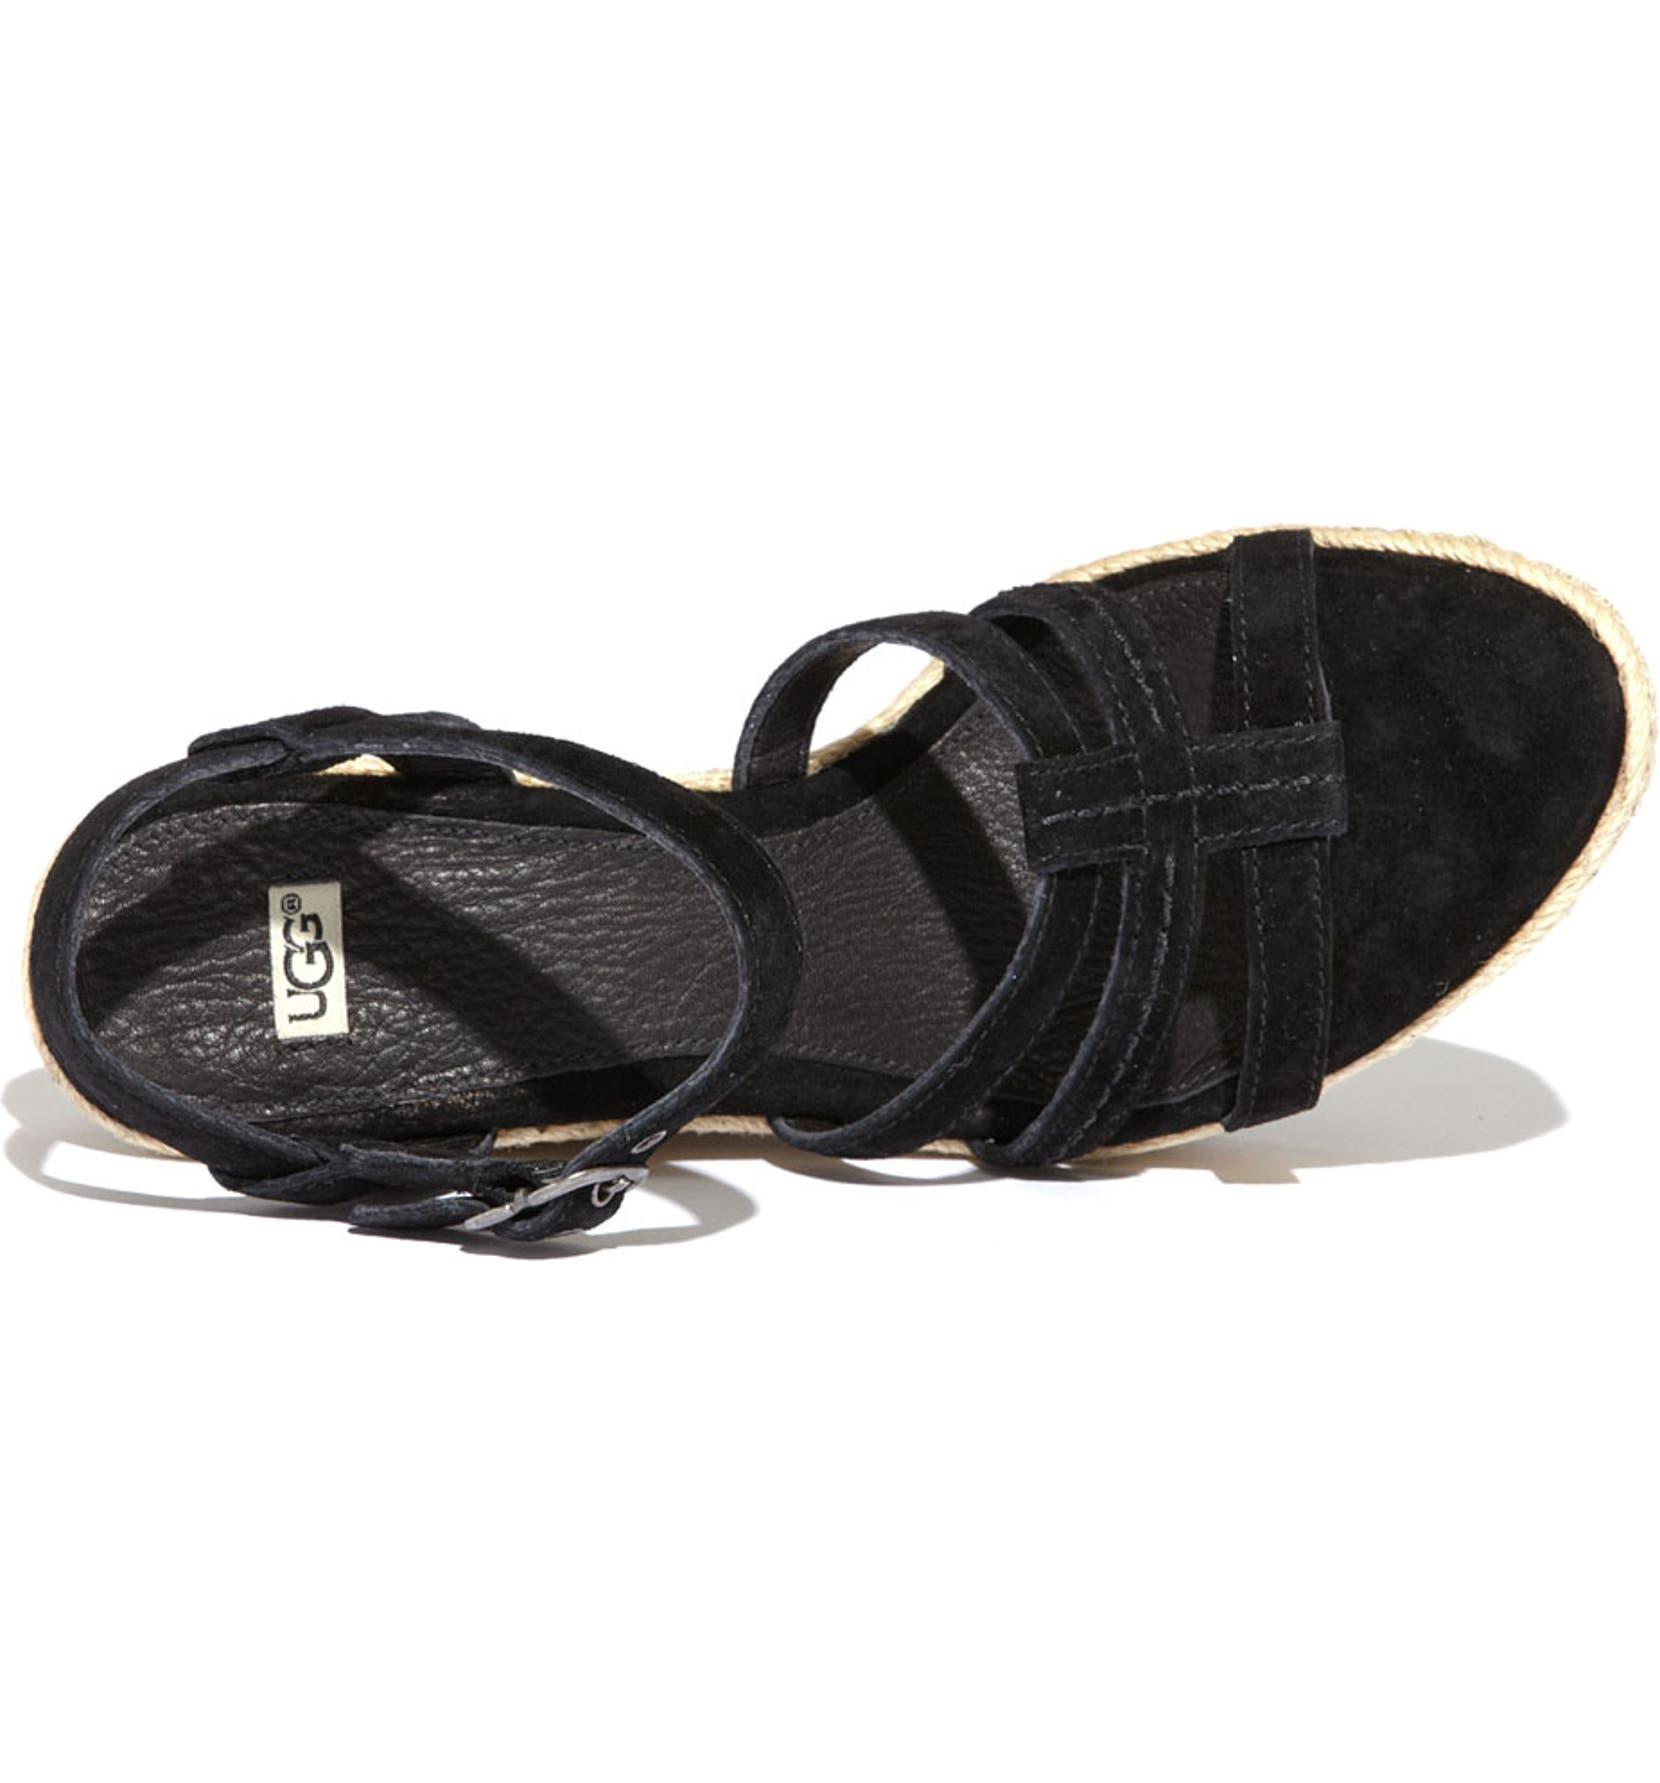 5af8c7cbe6a4 UGG® Australia  Callia  Sandal